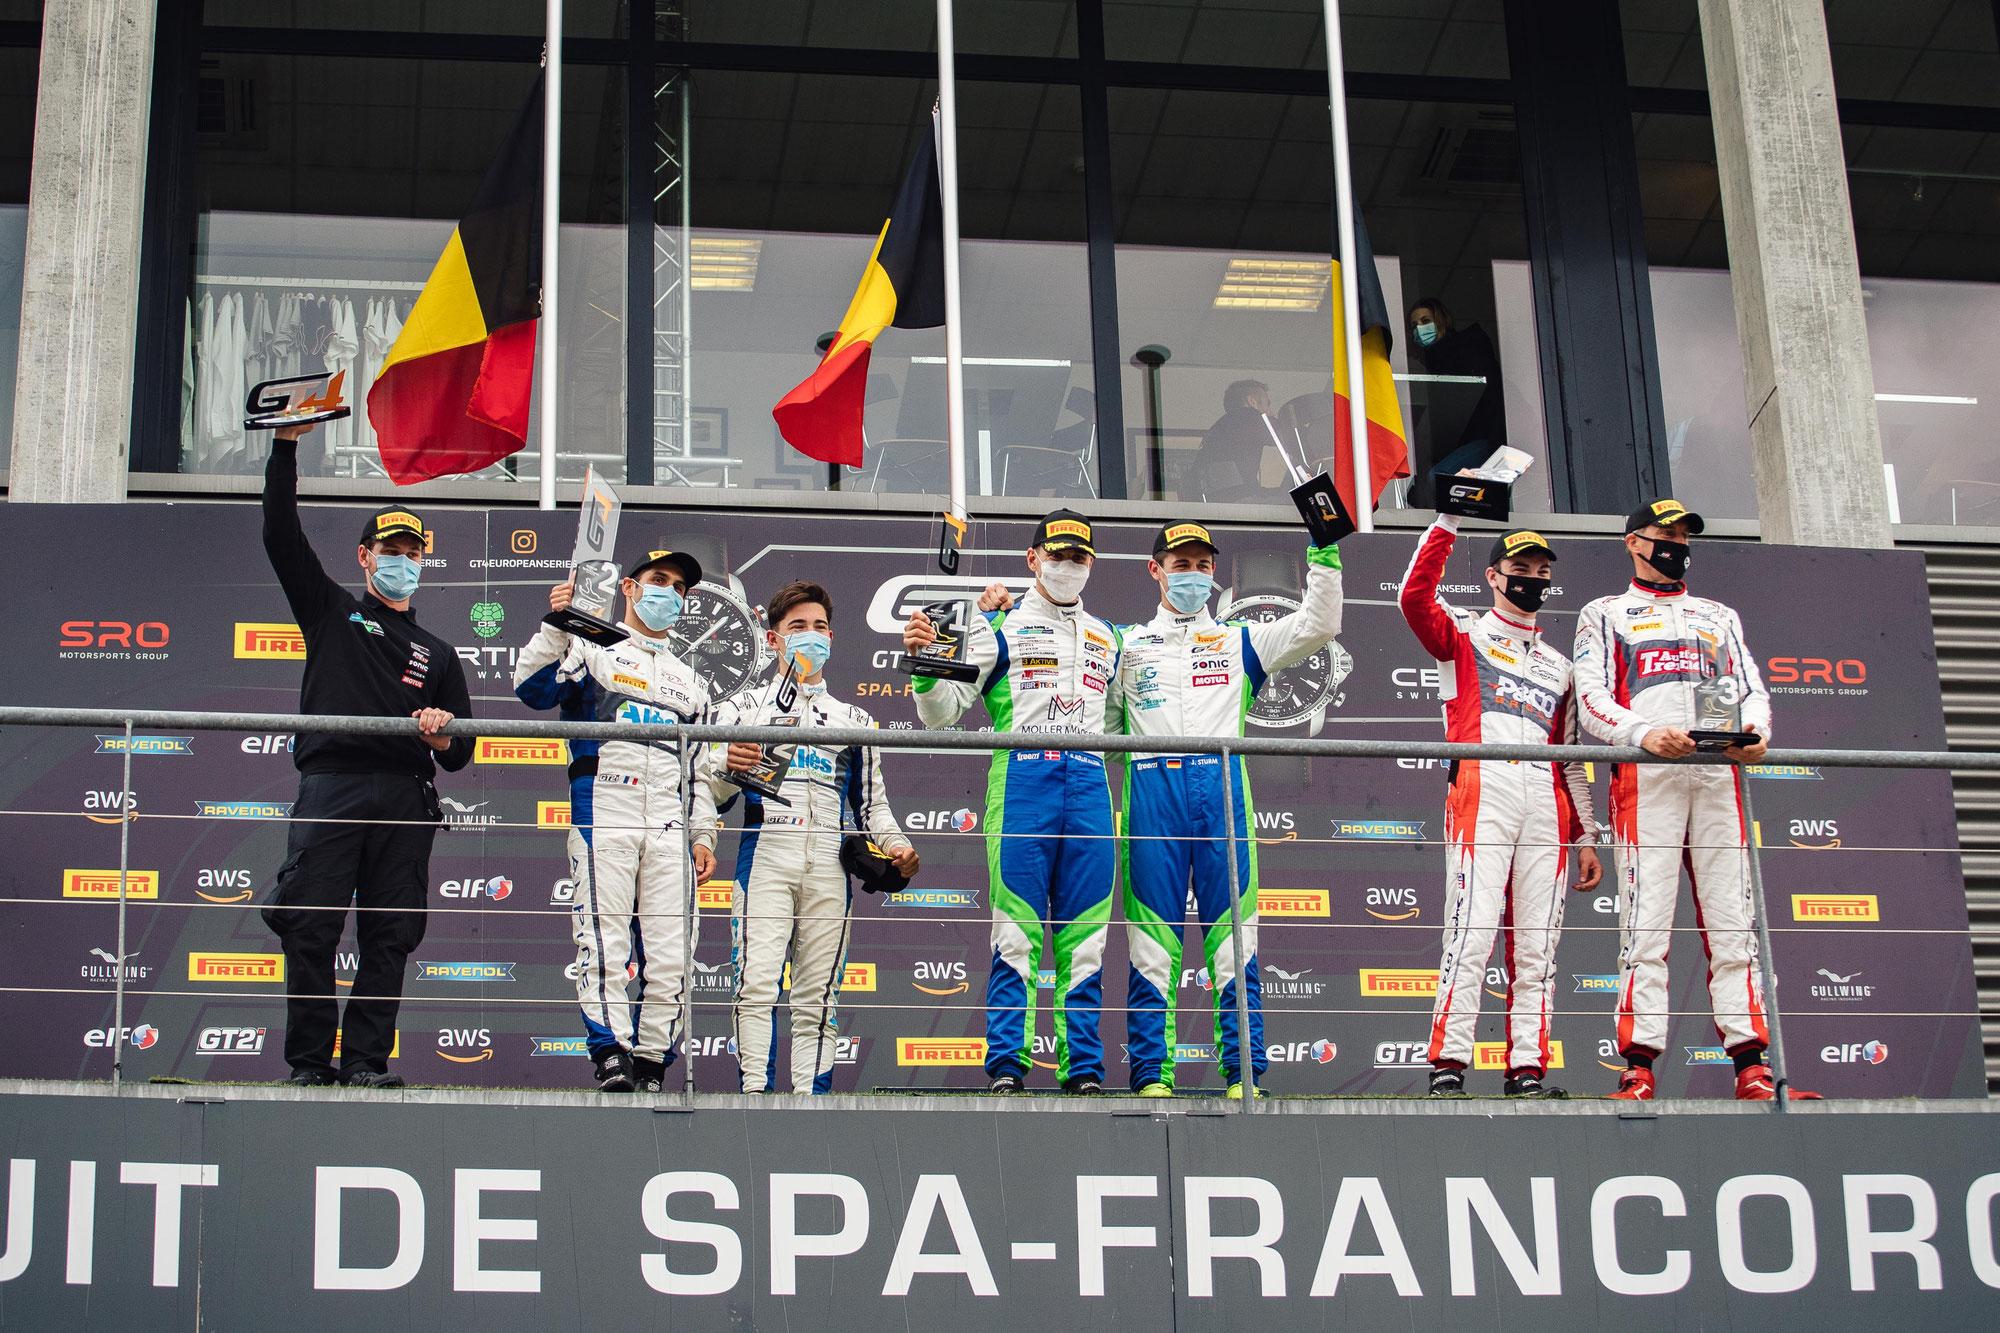 GT4 European Series, round 4: Joel Sturm siegt souverän in Spa-Francorchamps